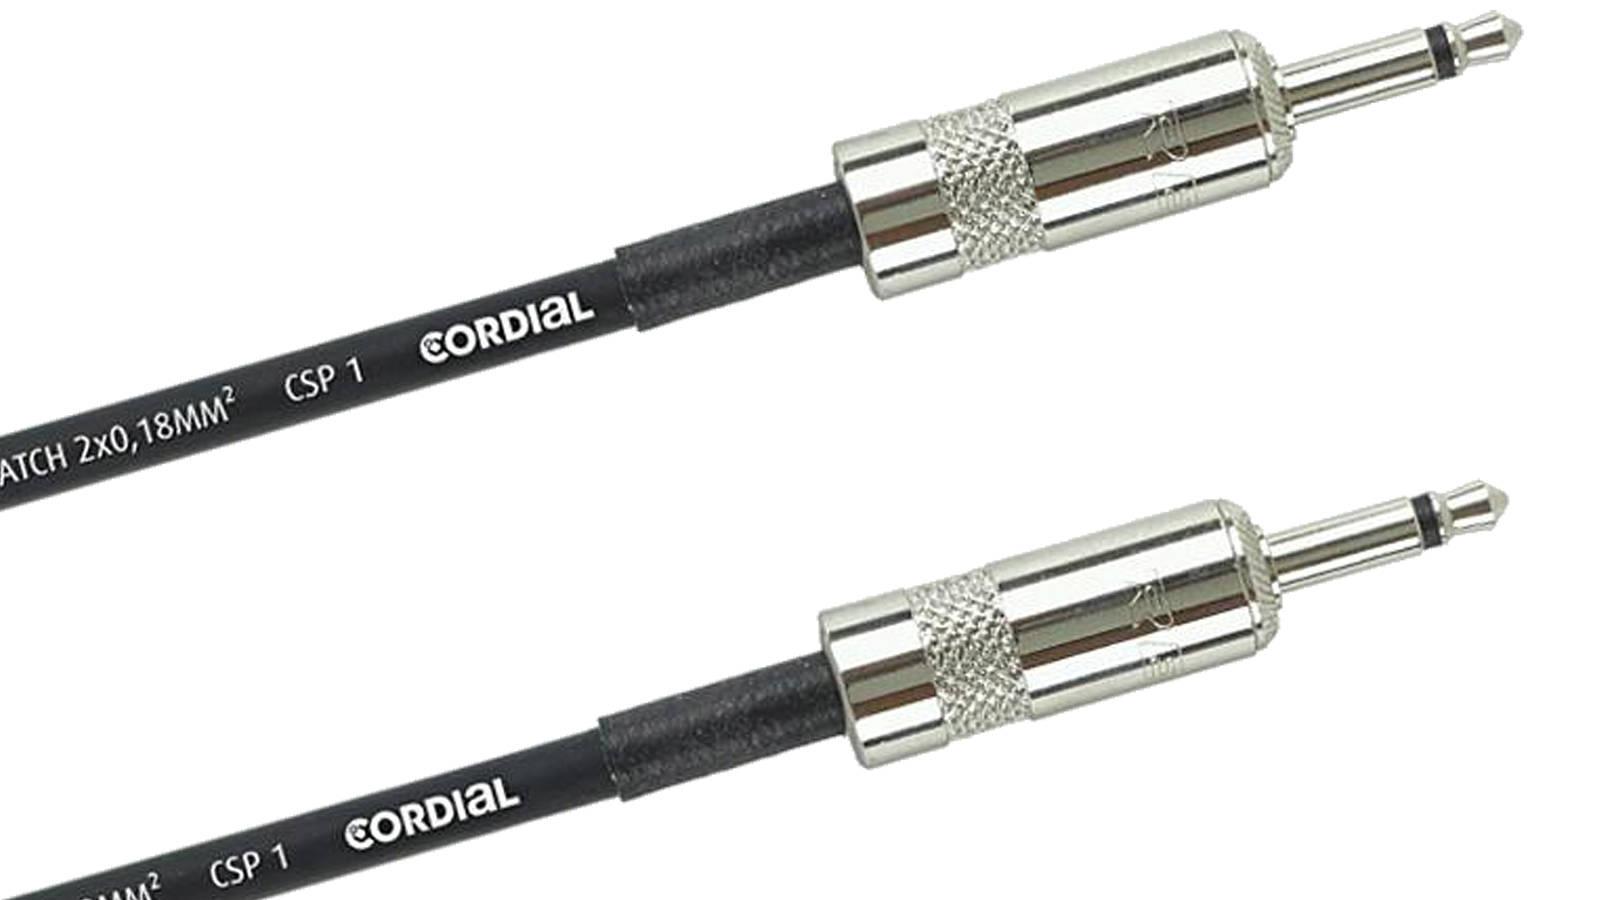 Cordial CPI 0,6 ZZ Patchkabel für Modularsysteme mKL-mKL 60 cm